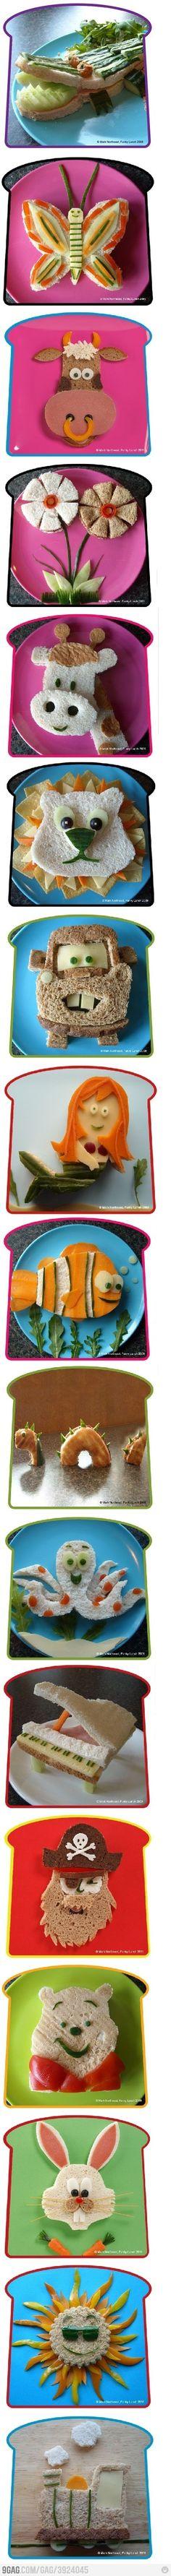 Gourmet Display gourmetdisplay on Pinterest